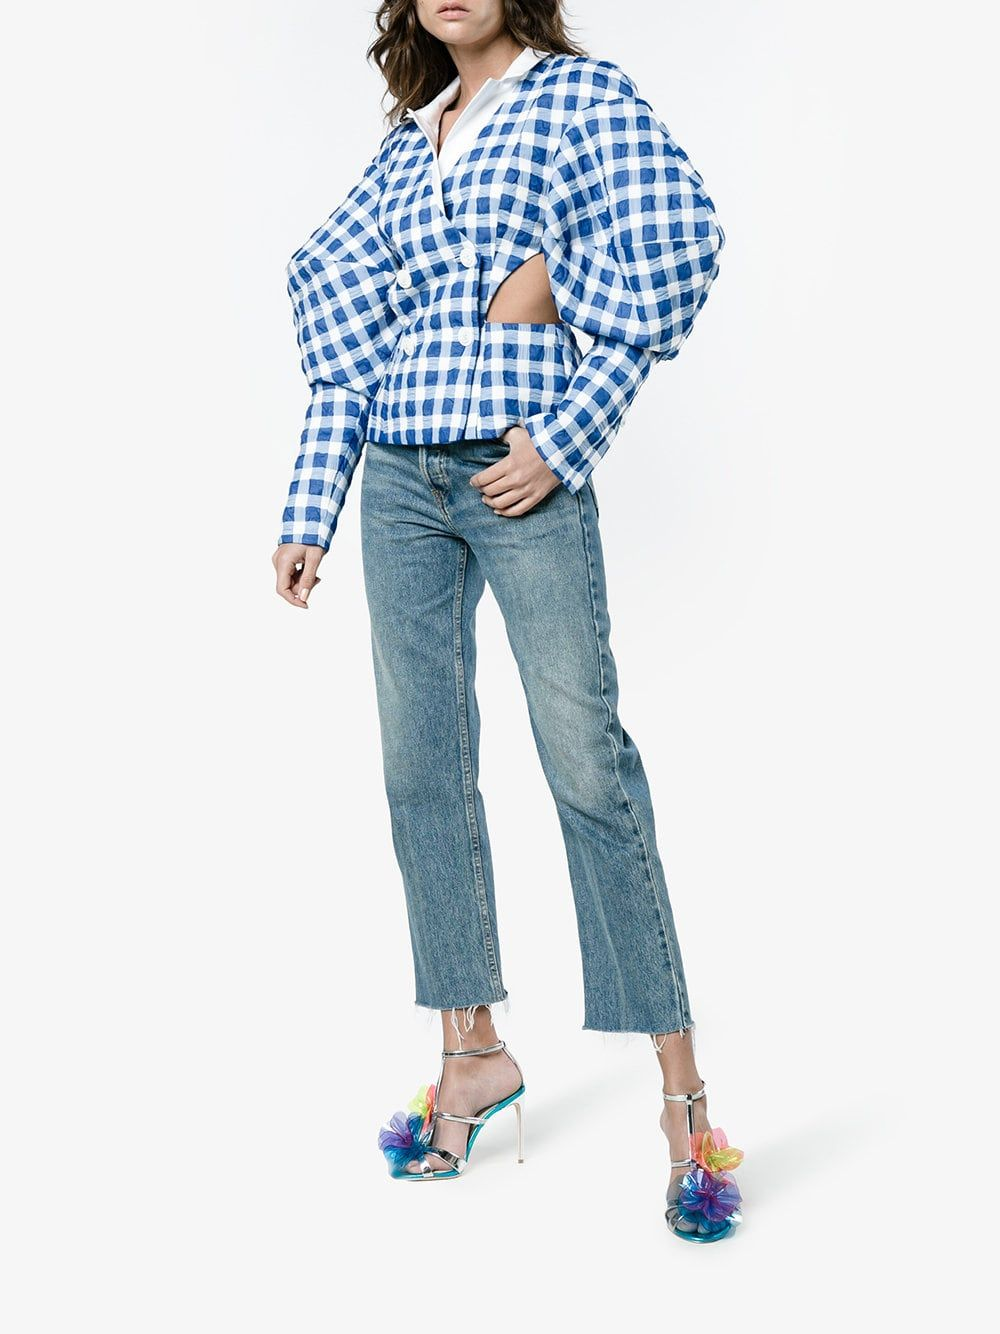 a3f2437f925 Sophia Webster jumbo lilico 100 PVC sandals